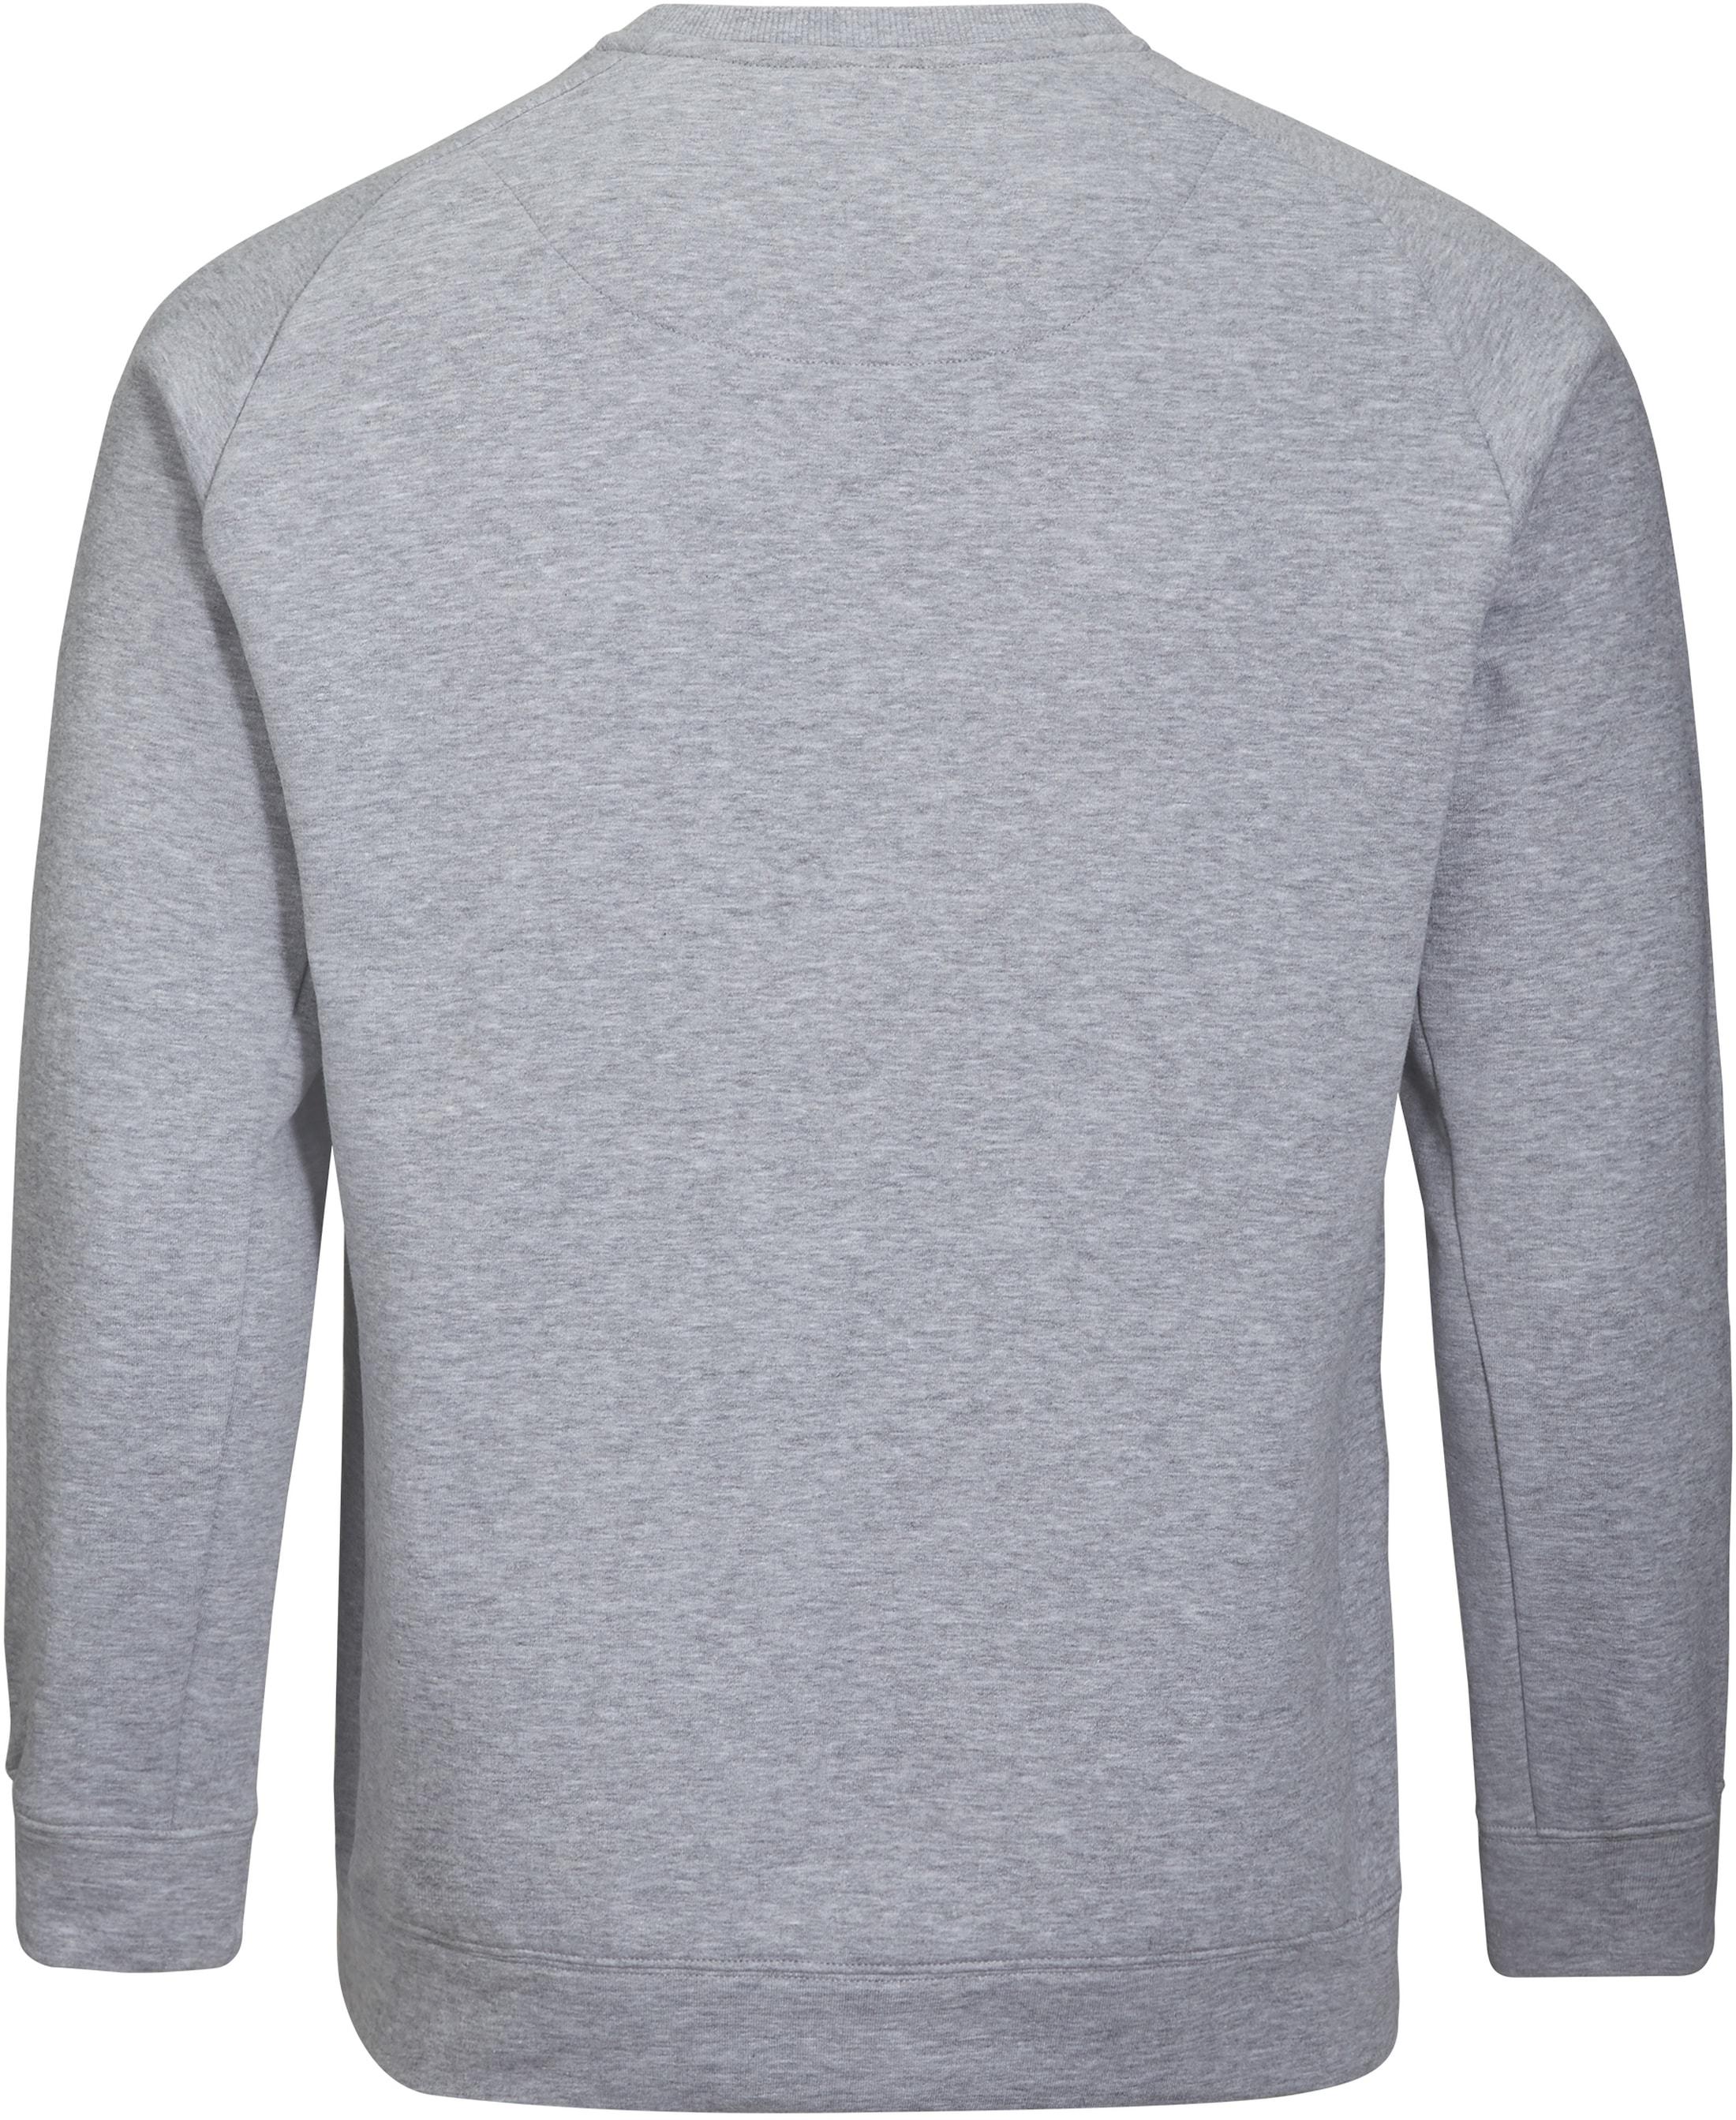 Bjorn Borg Sweater Crew Melange Grey foto 2